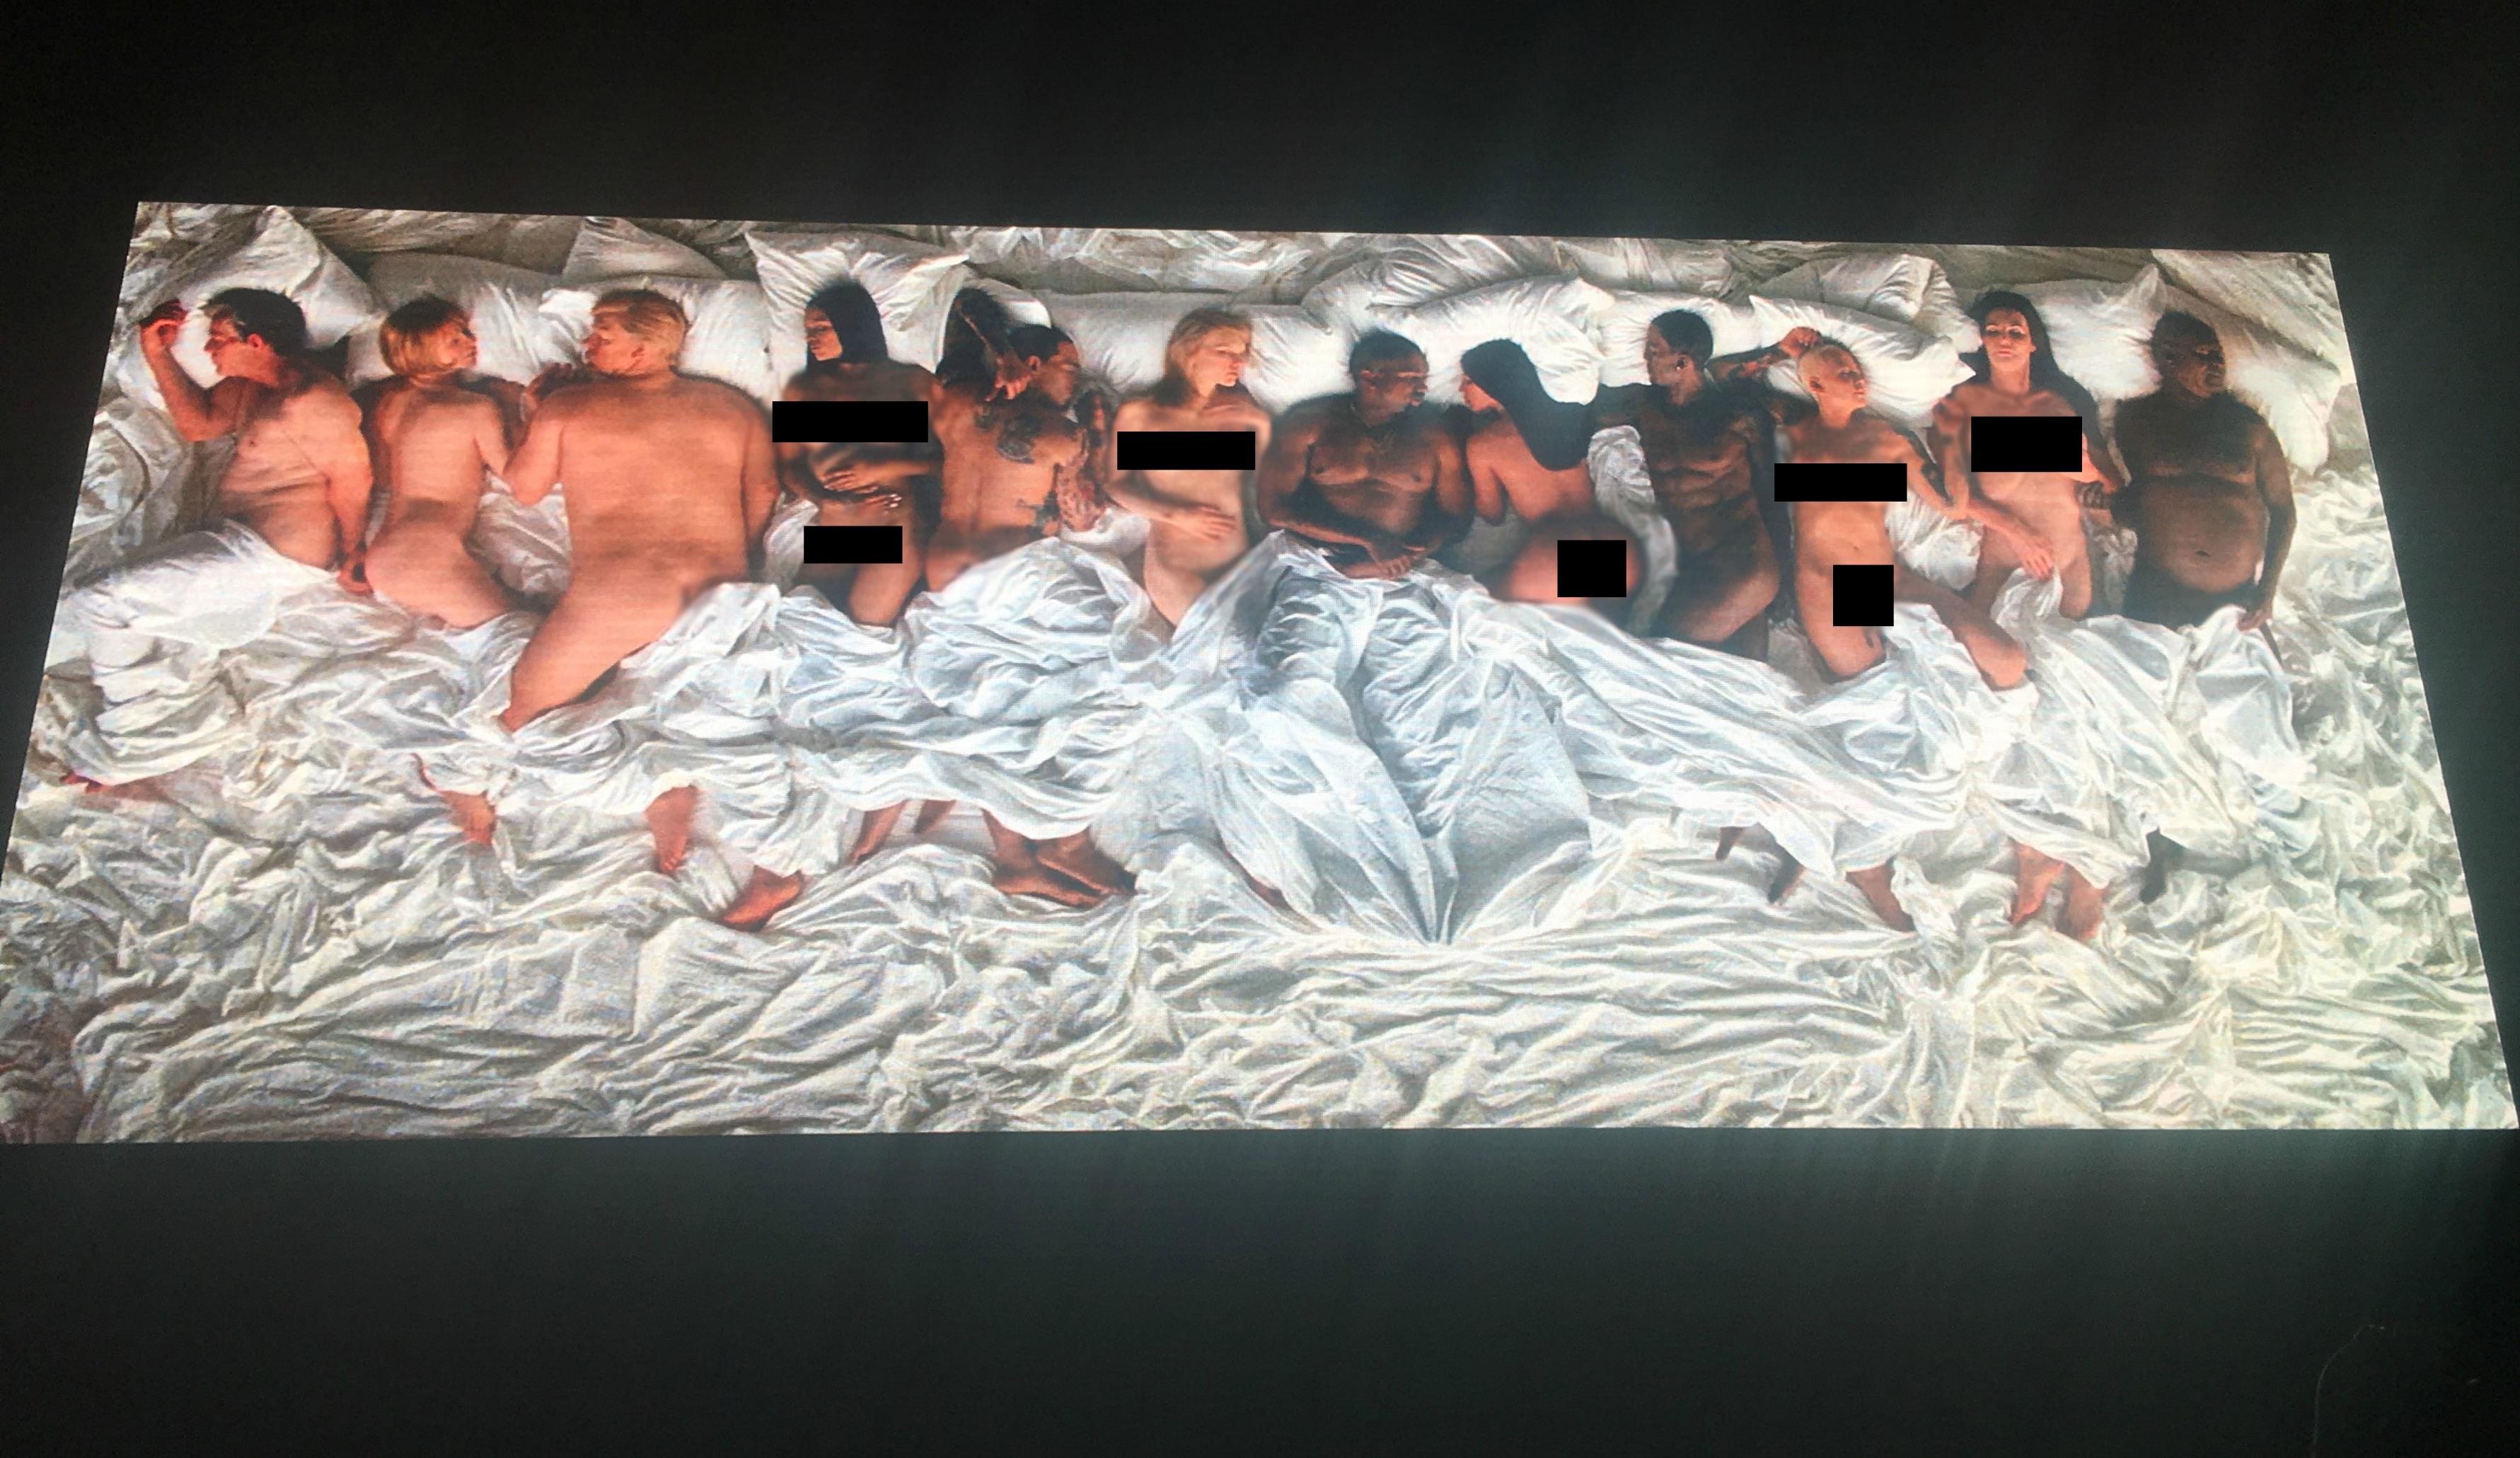 Kanye west naked foto 22